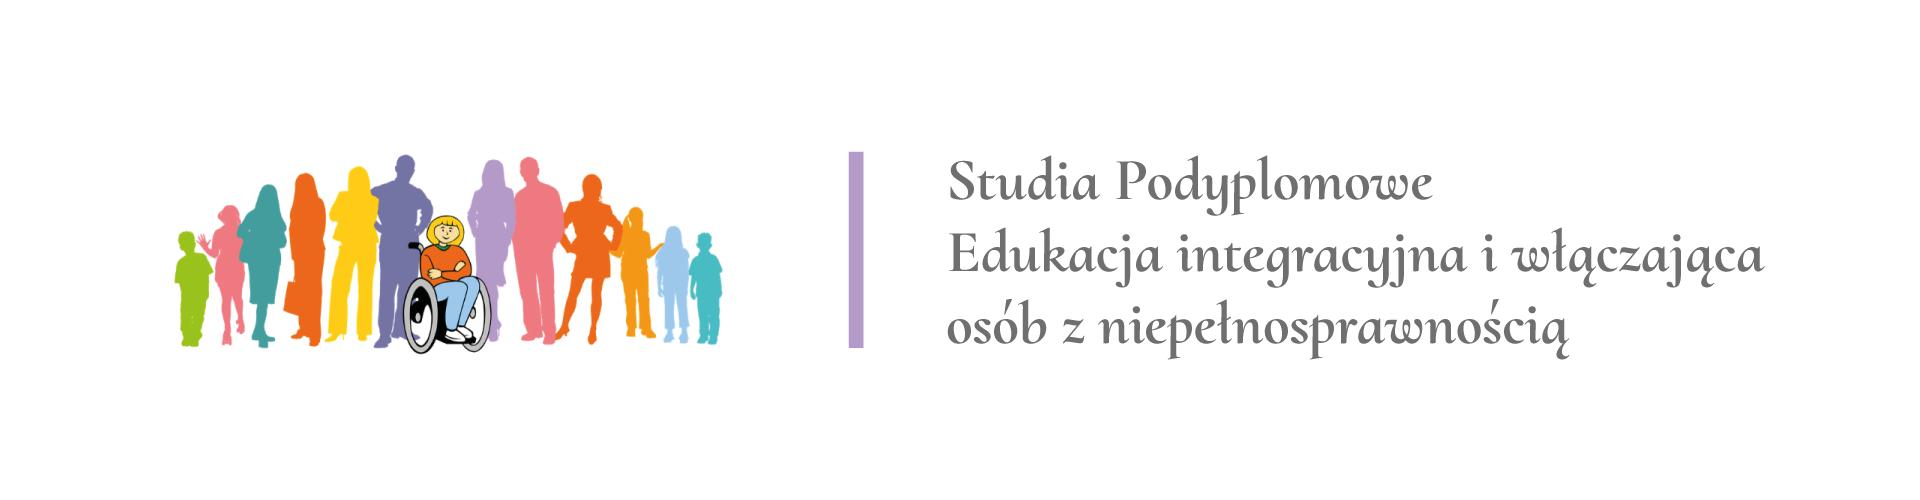 Studia podyplomowe - rekrutacja